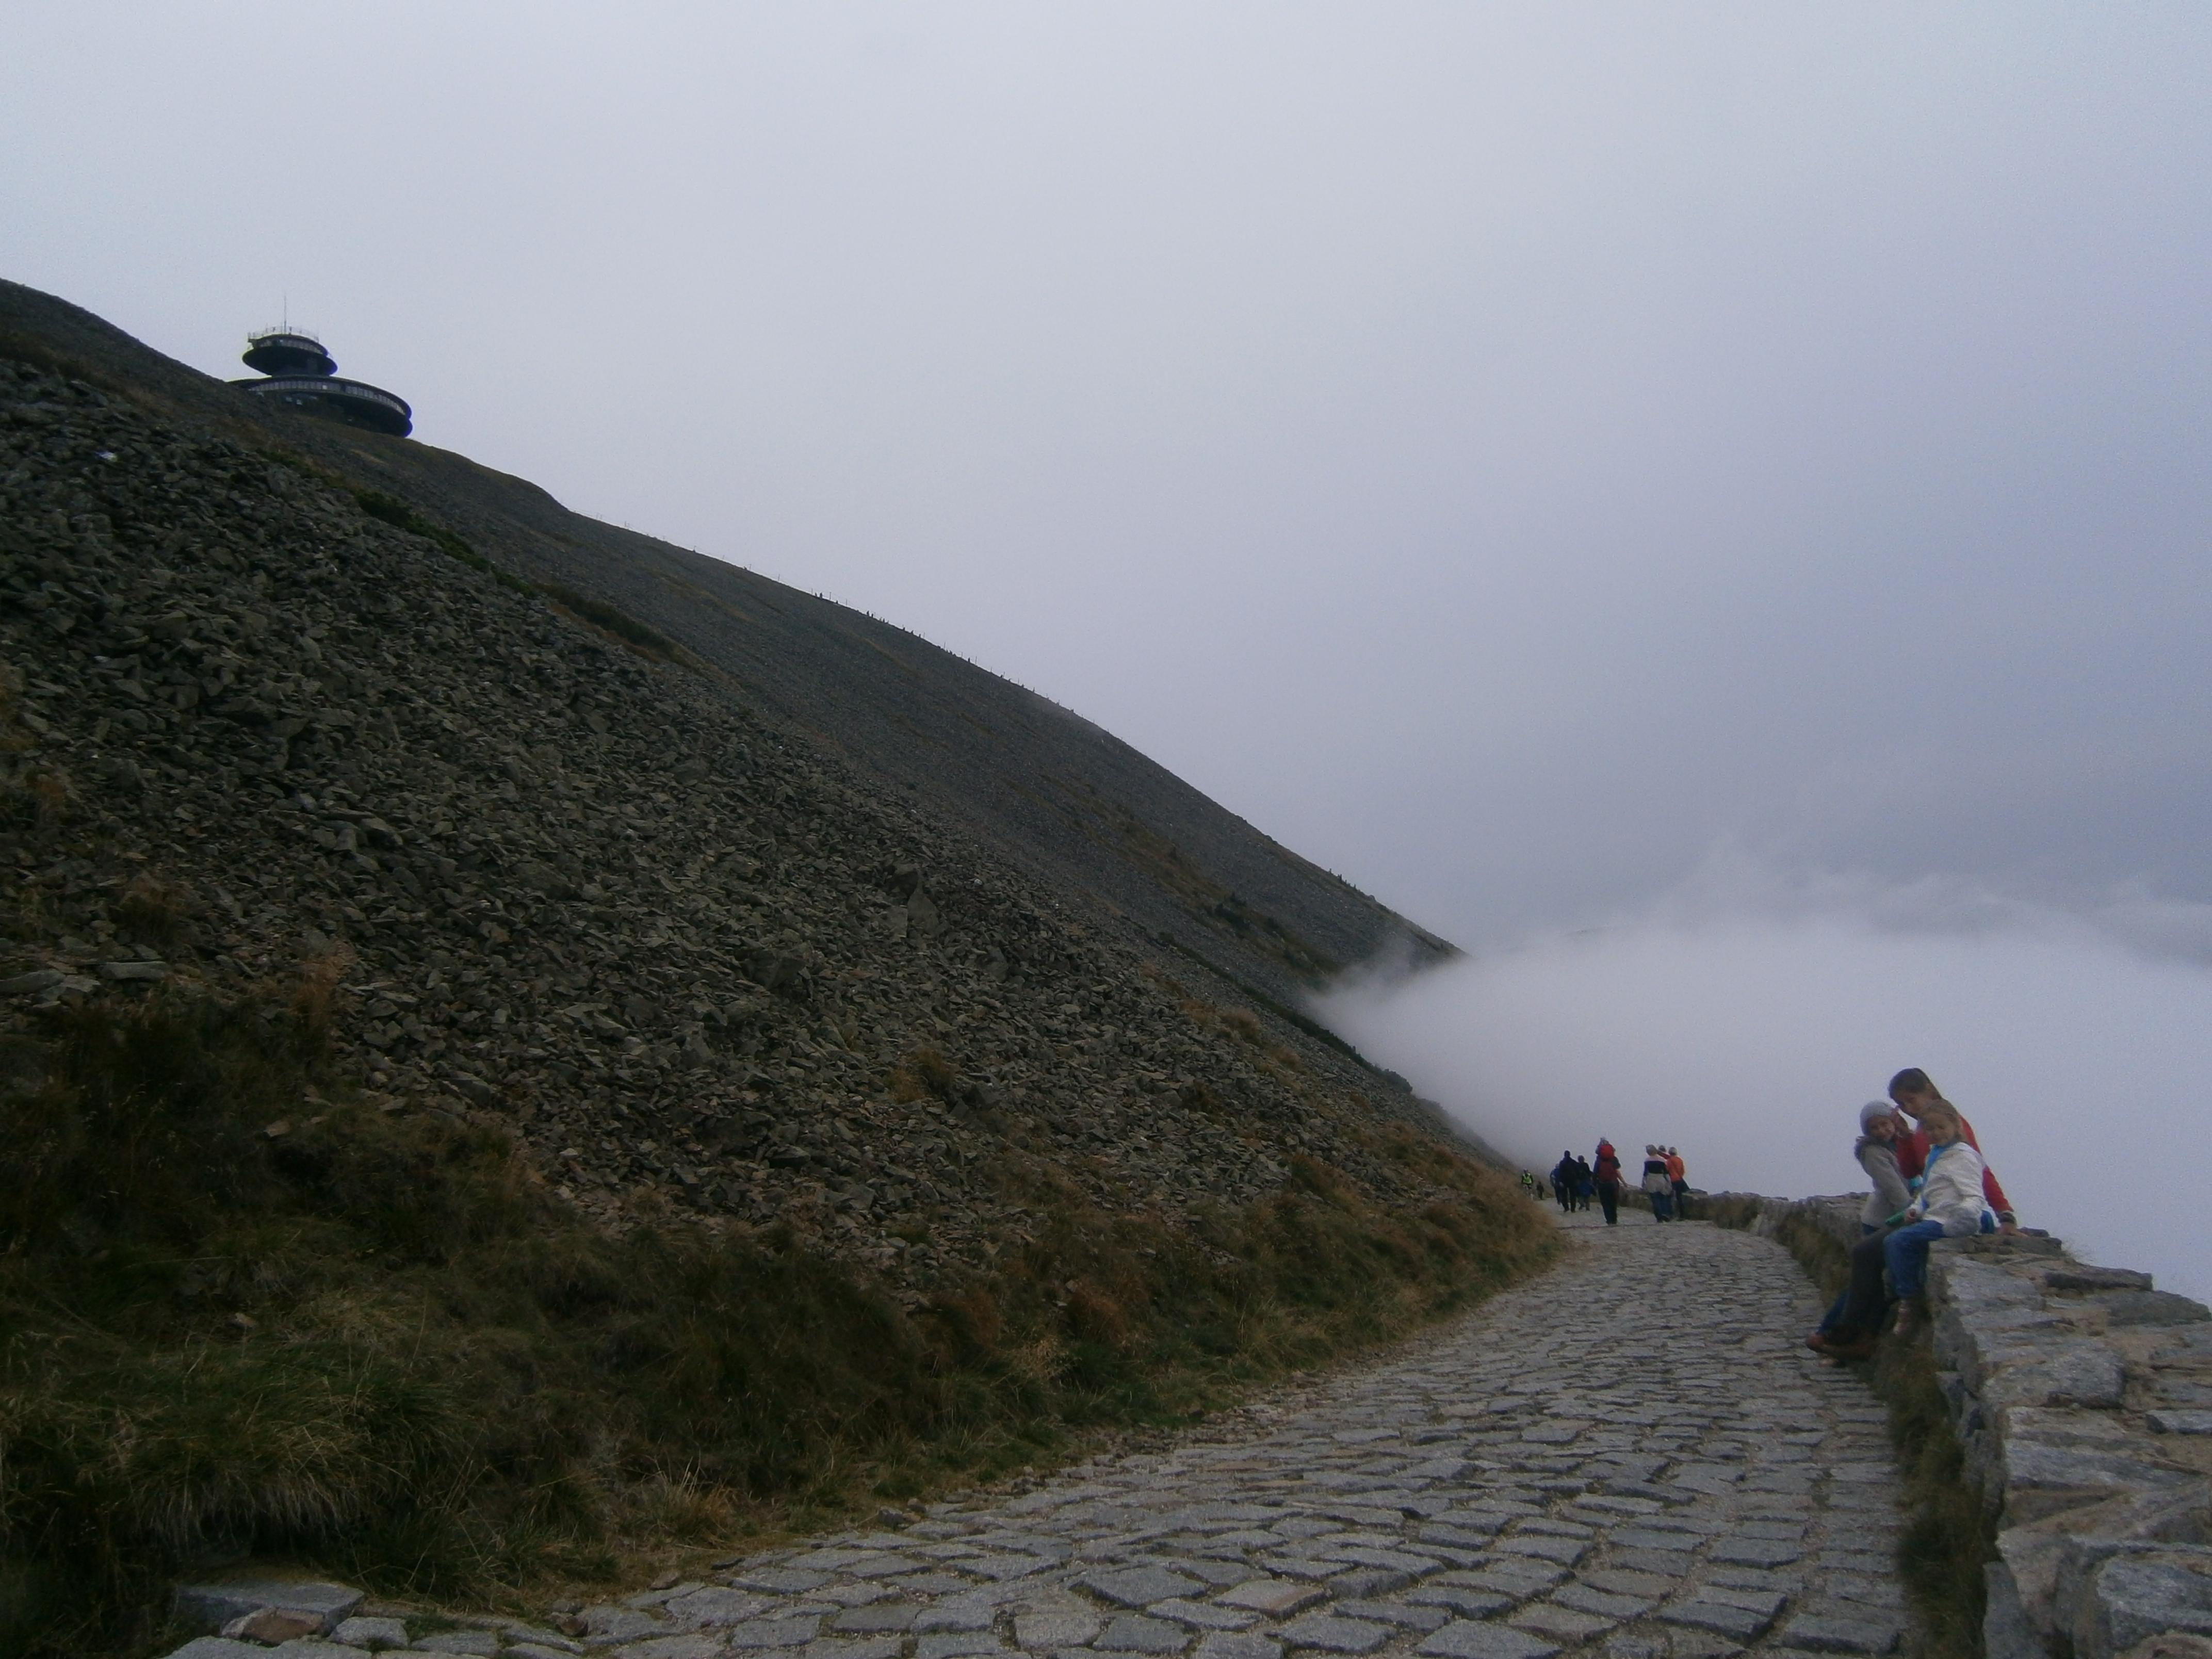 chmura wspina się na górę